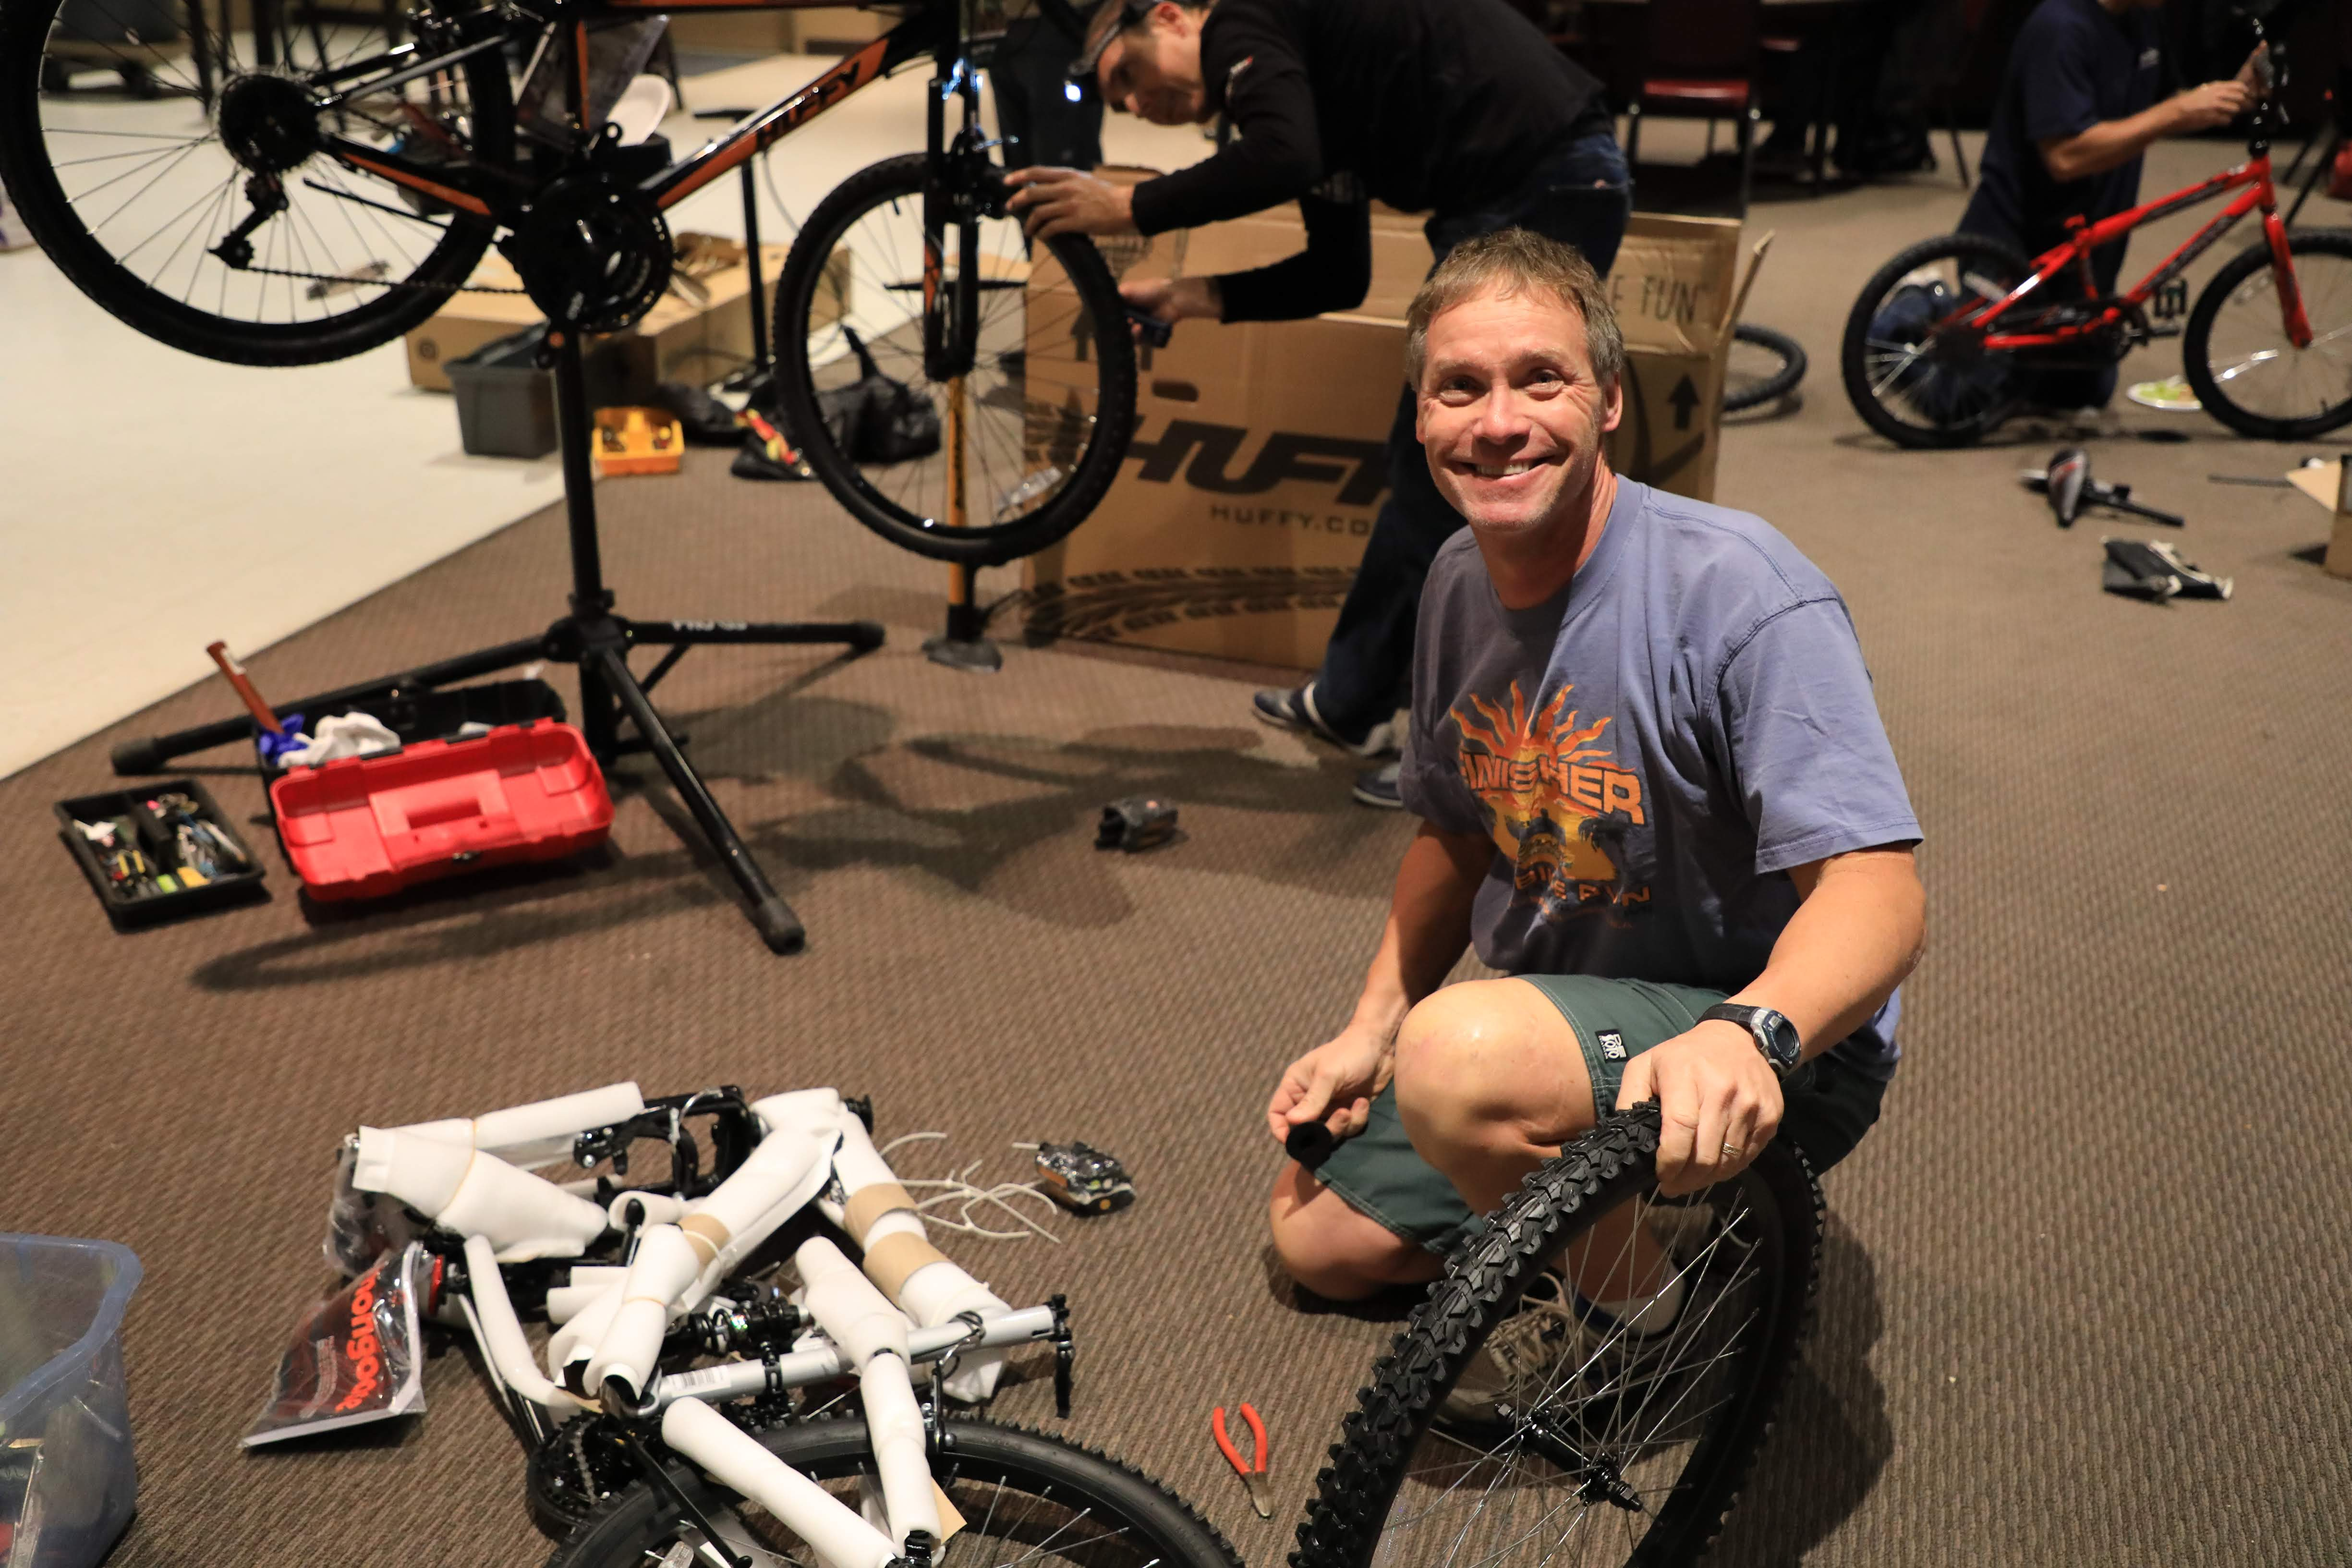 Participate in our Build a Bike Pa